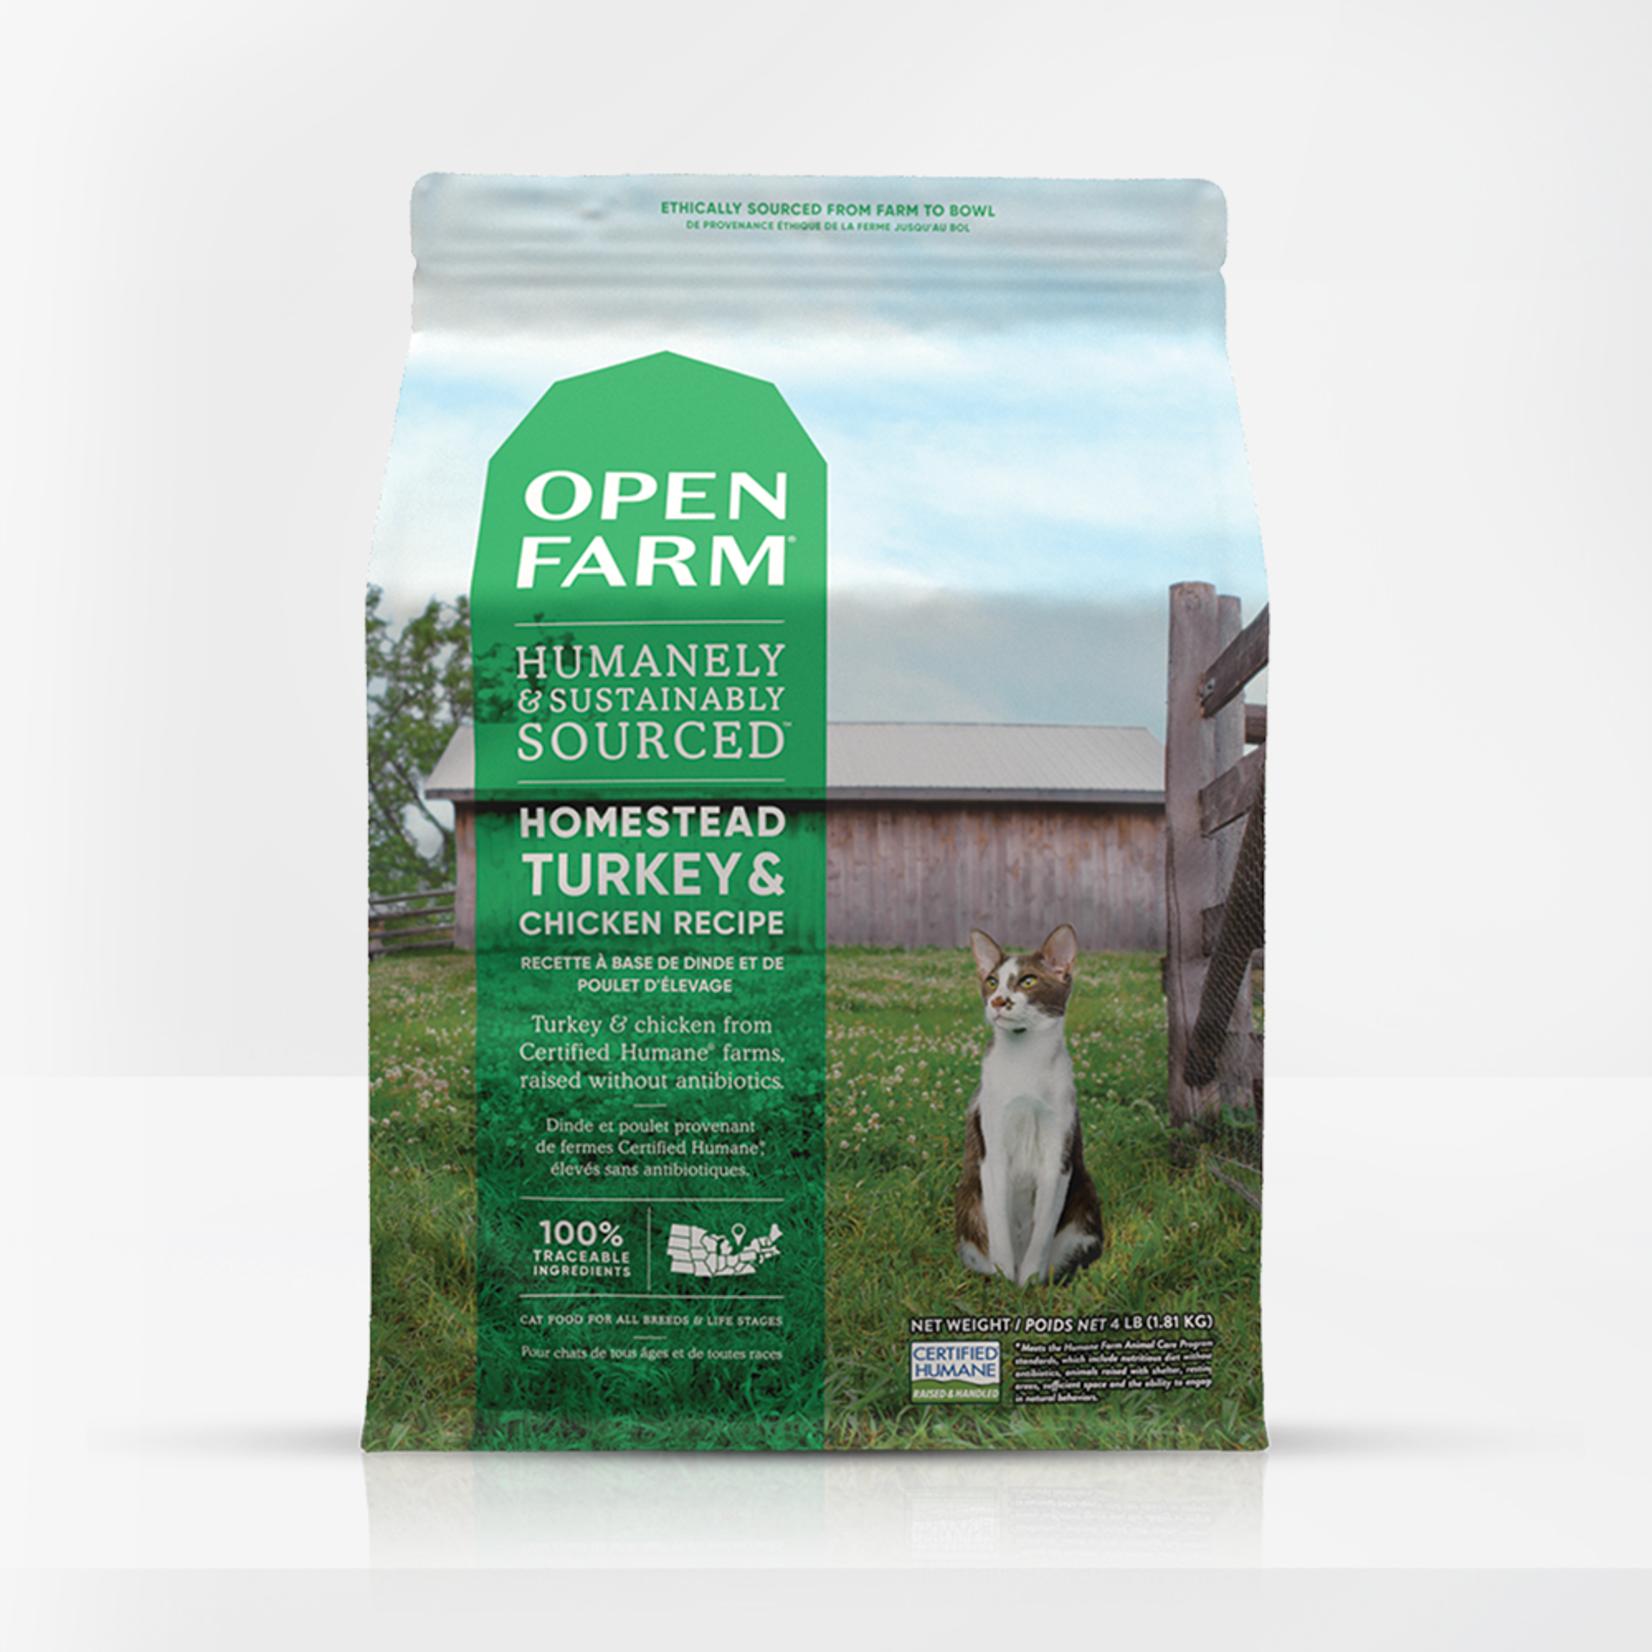 Open Farm Homestead Turkey & Chicken (8 lbs)